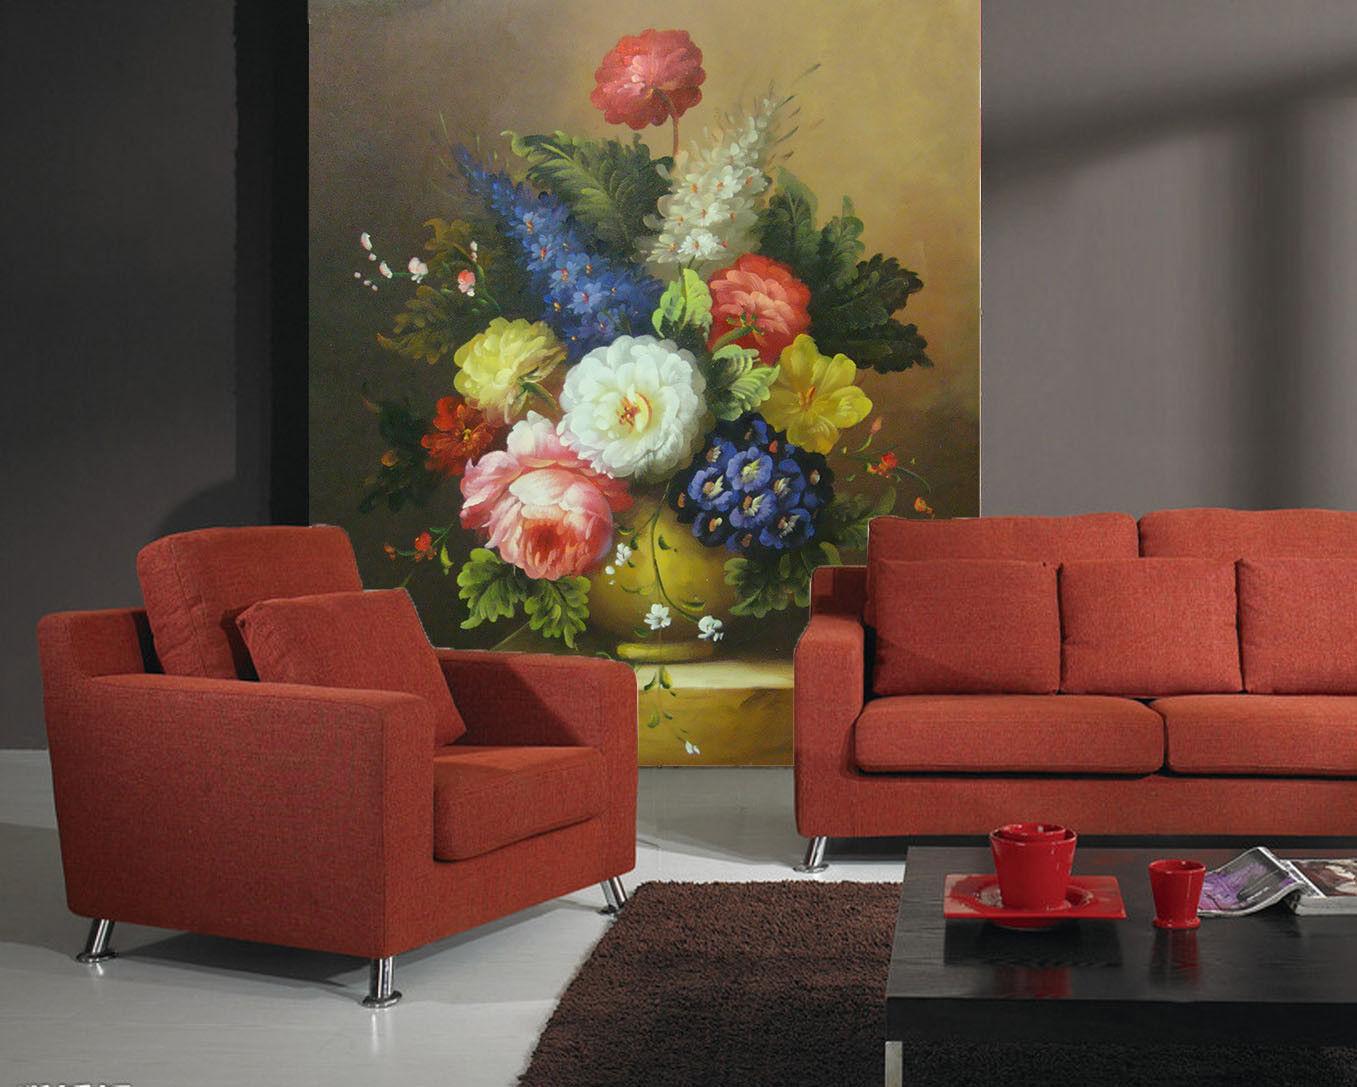 3d Flower Vase Table 74 wandpaper Mural wandpaper wandpaper Picture Family De Summer